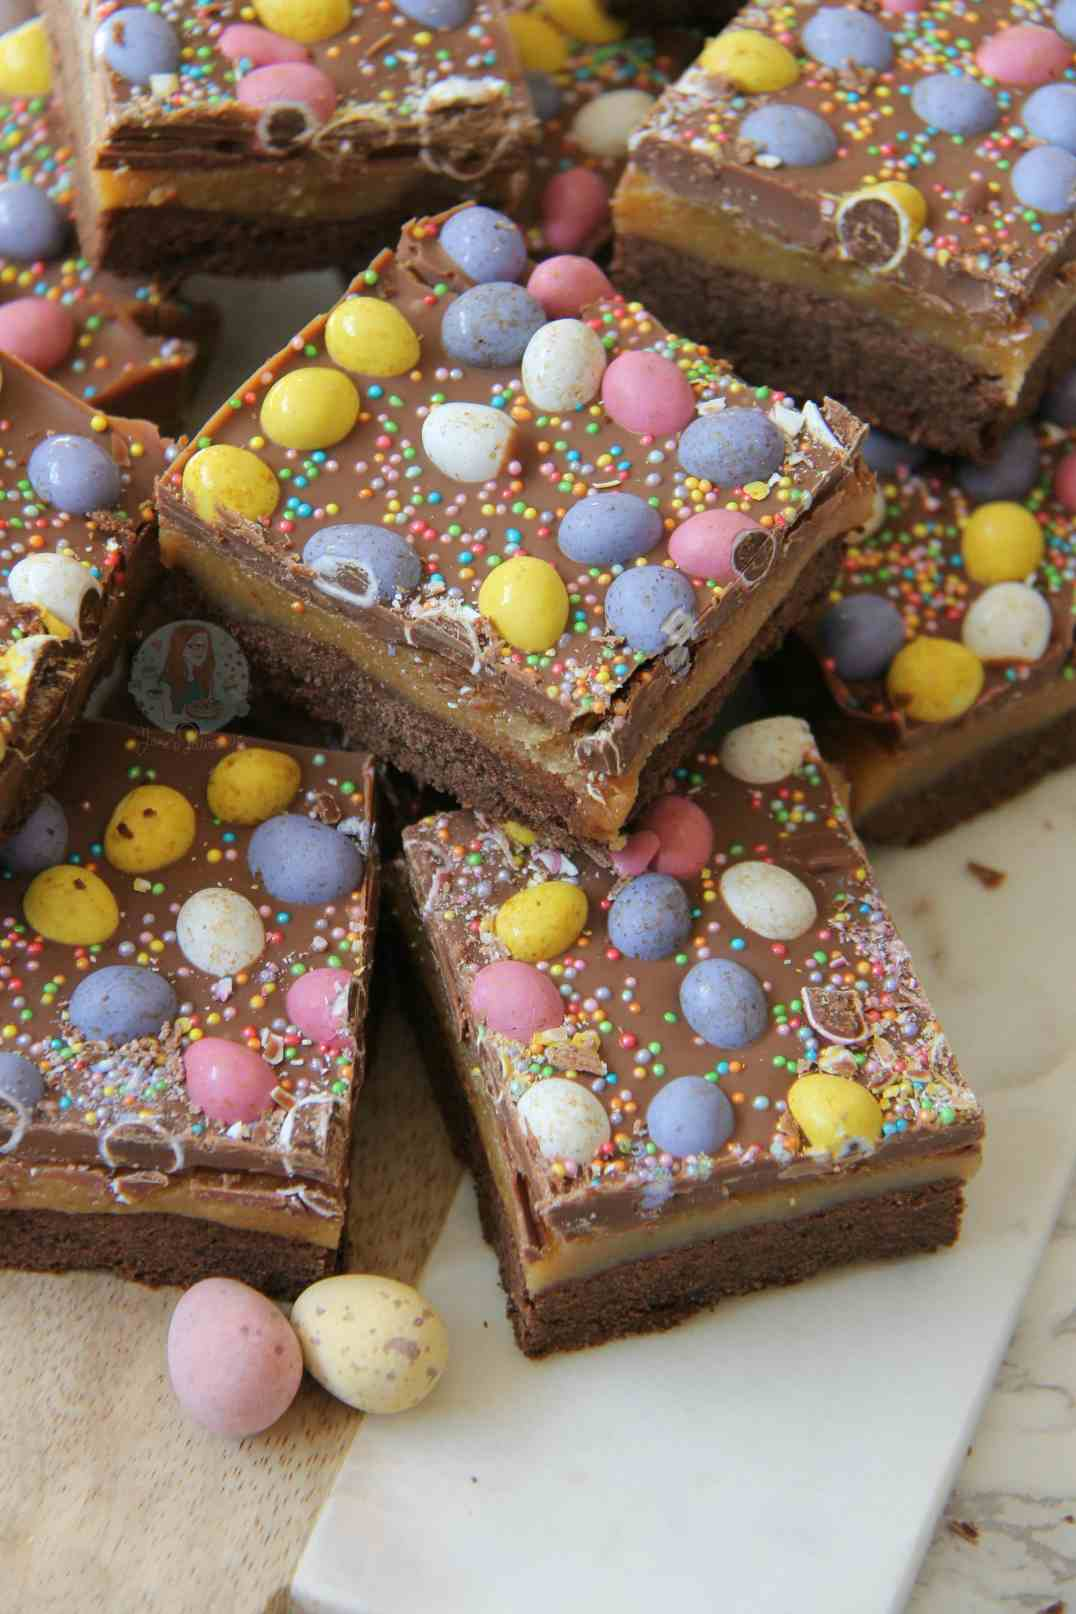 Easter Chocolate Millionaires Shortbread